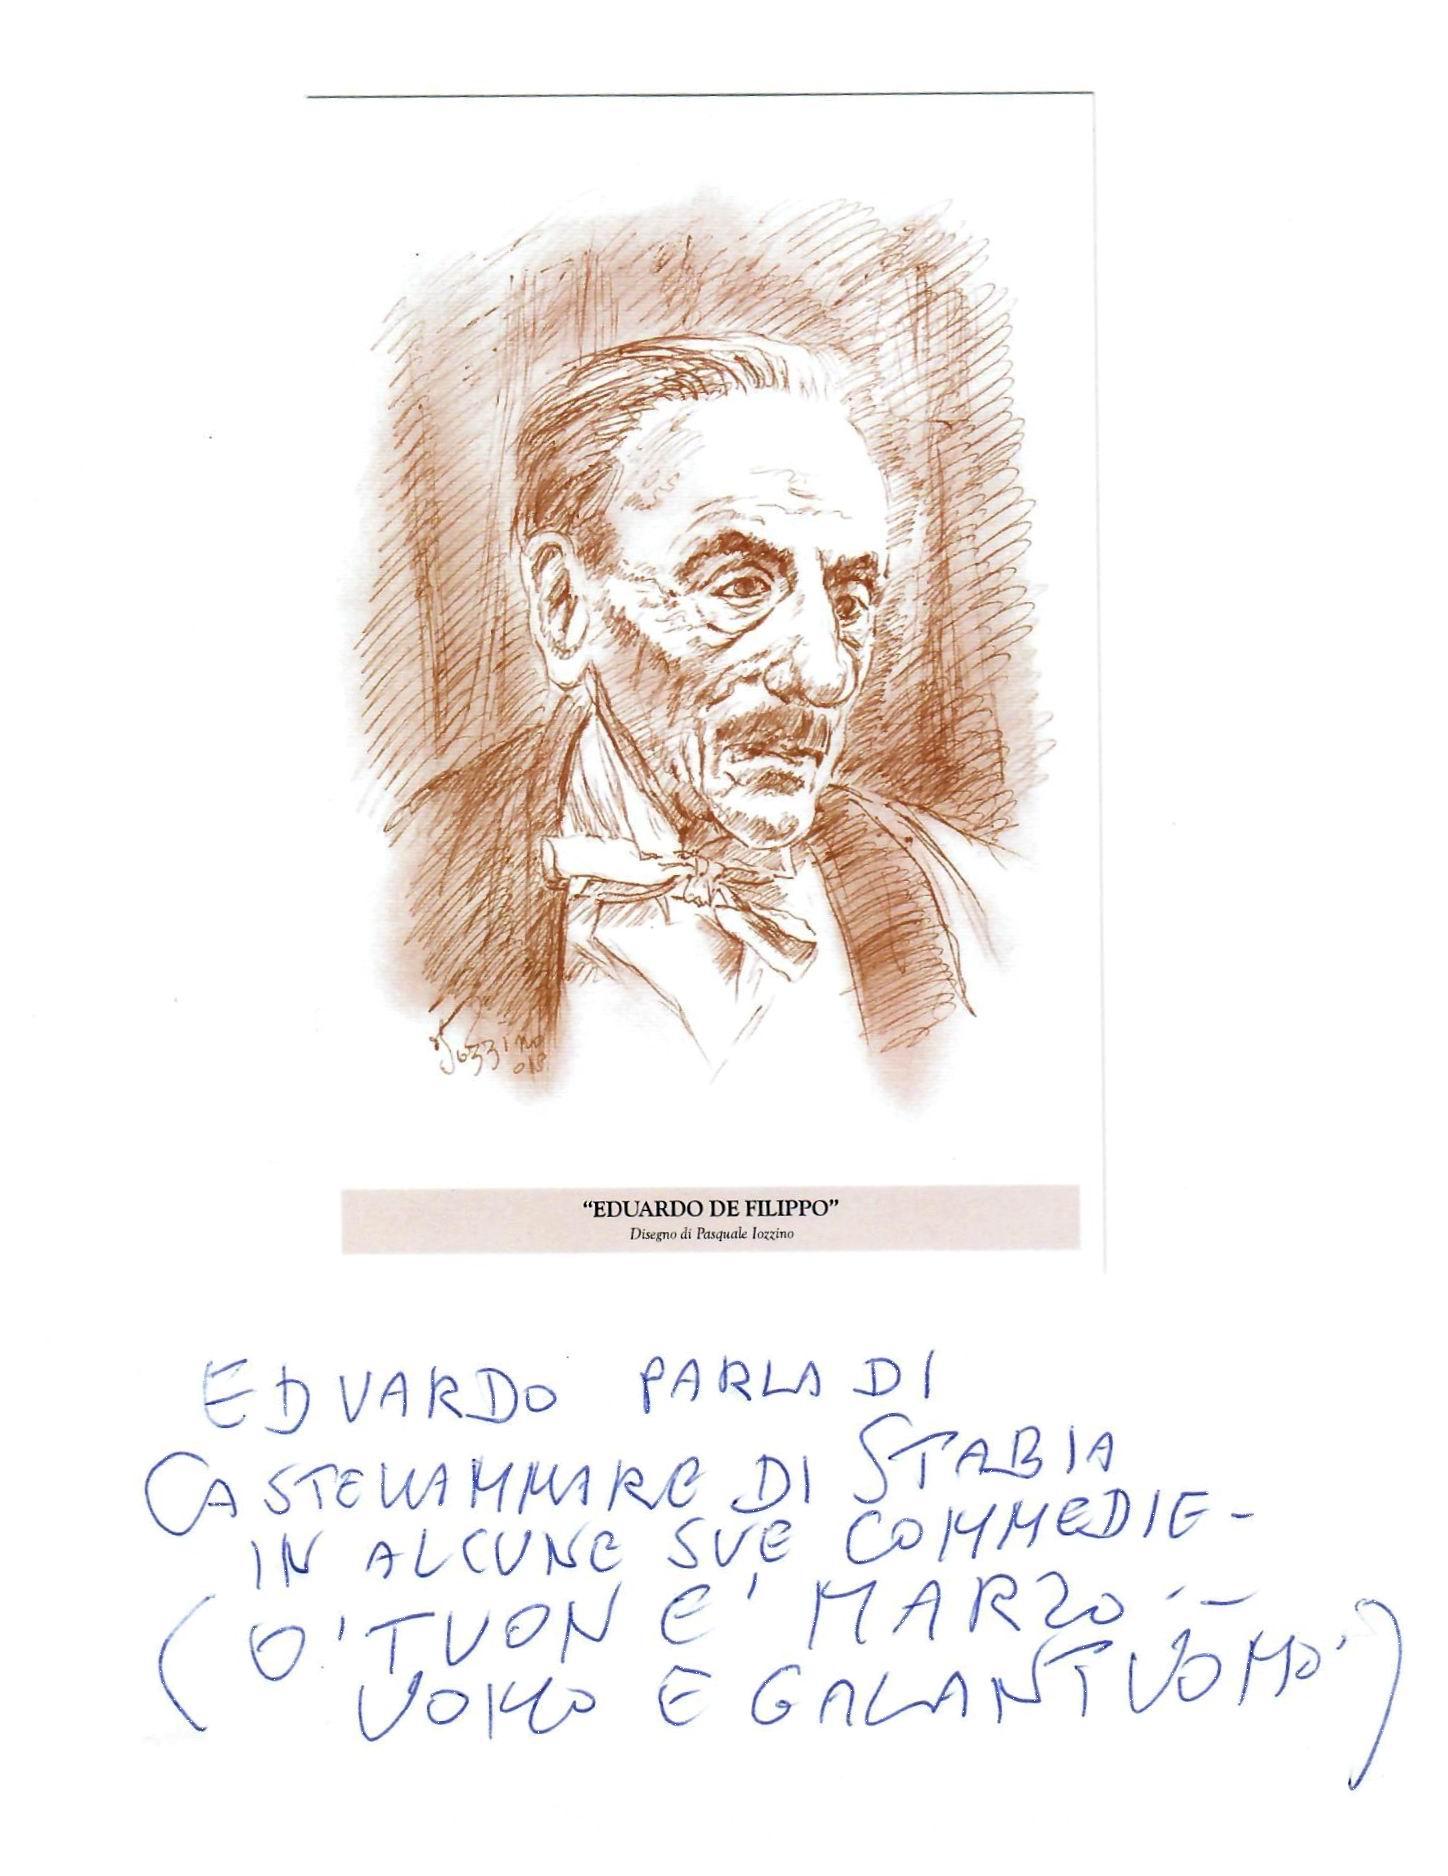 Eduardo De Filippo (opera del prof. Pasquale Iozzino)